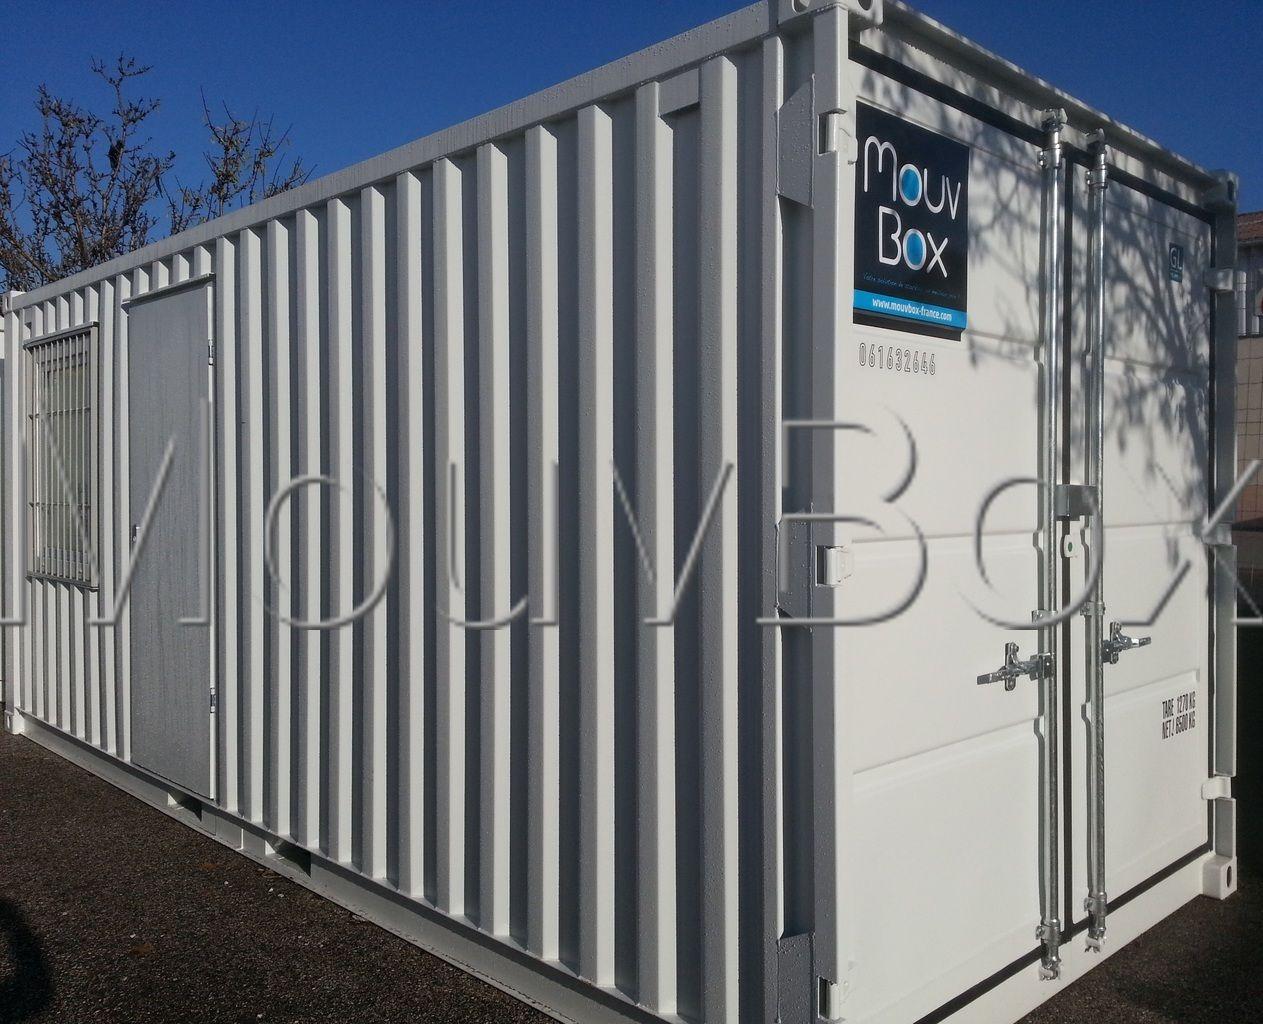 Mouvbox france conteneur container dry neuf bureau stockage